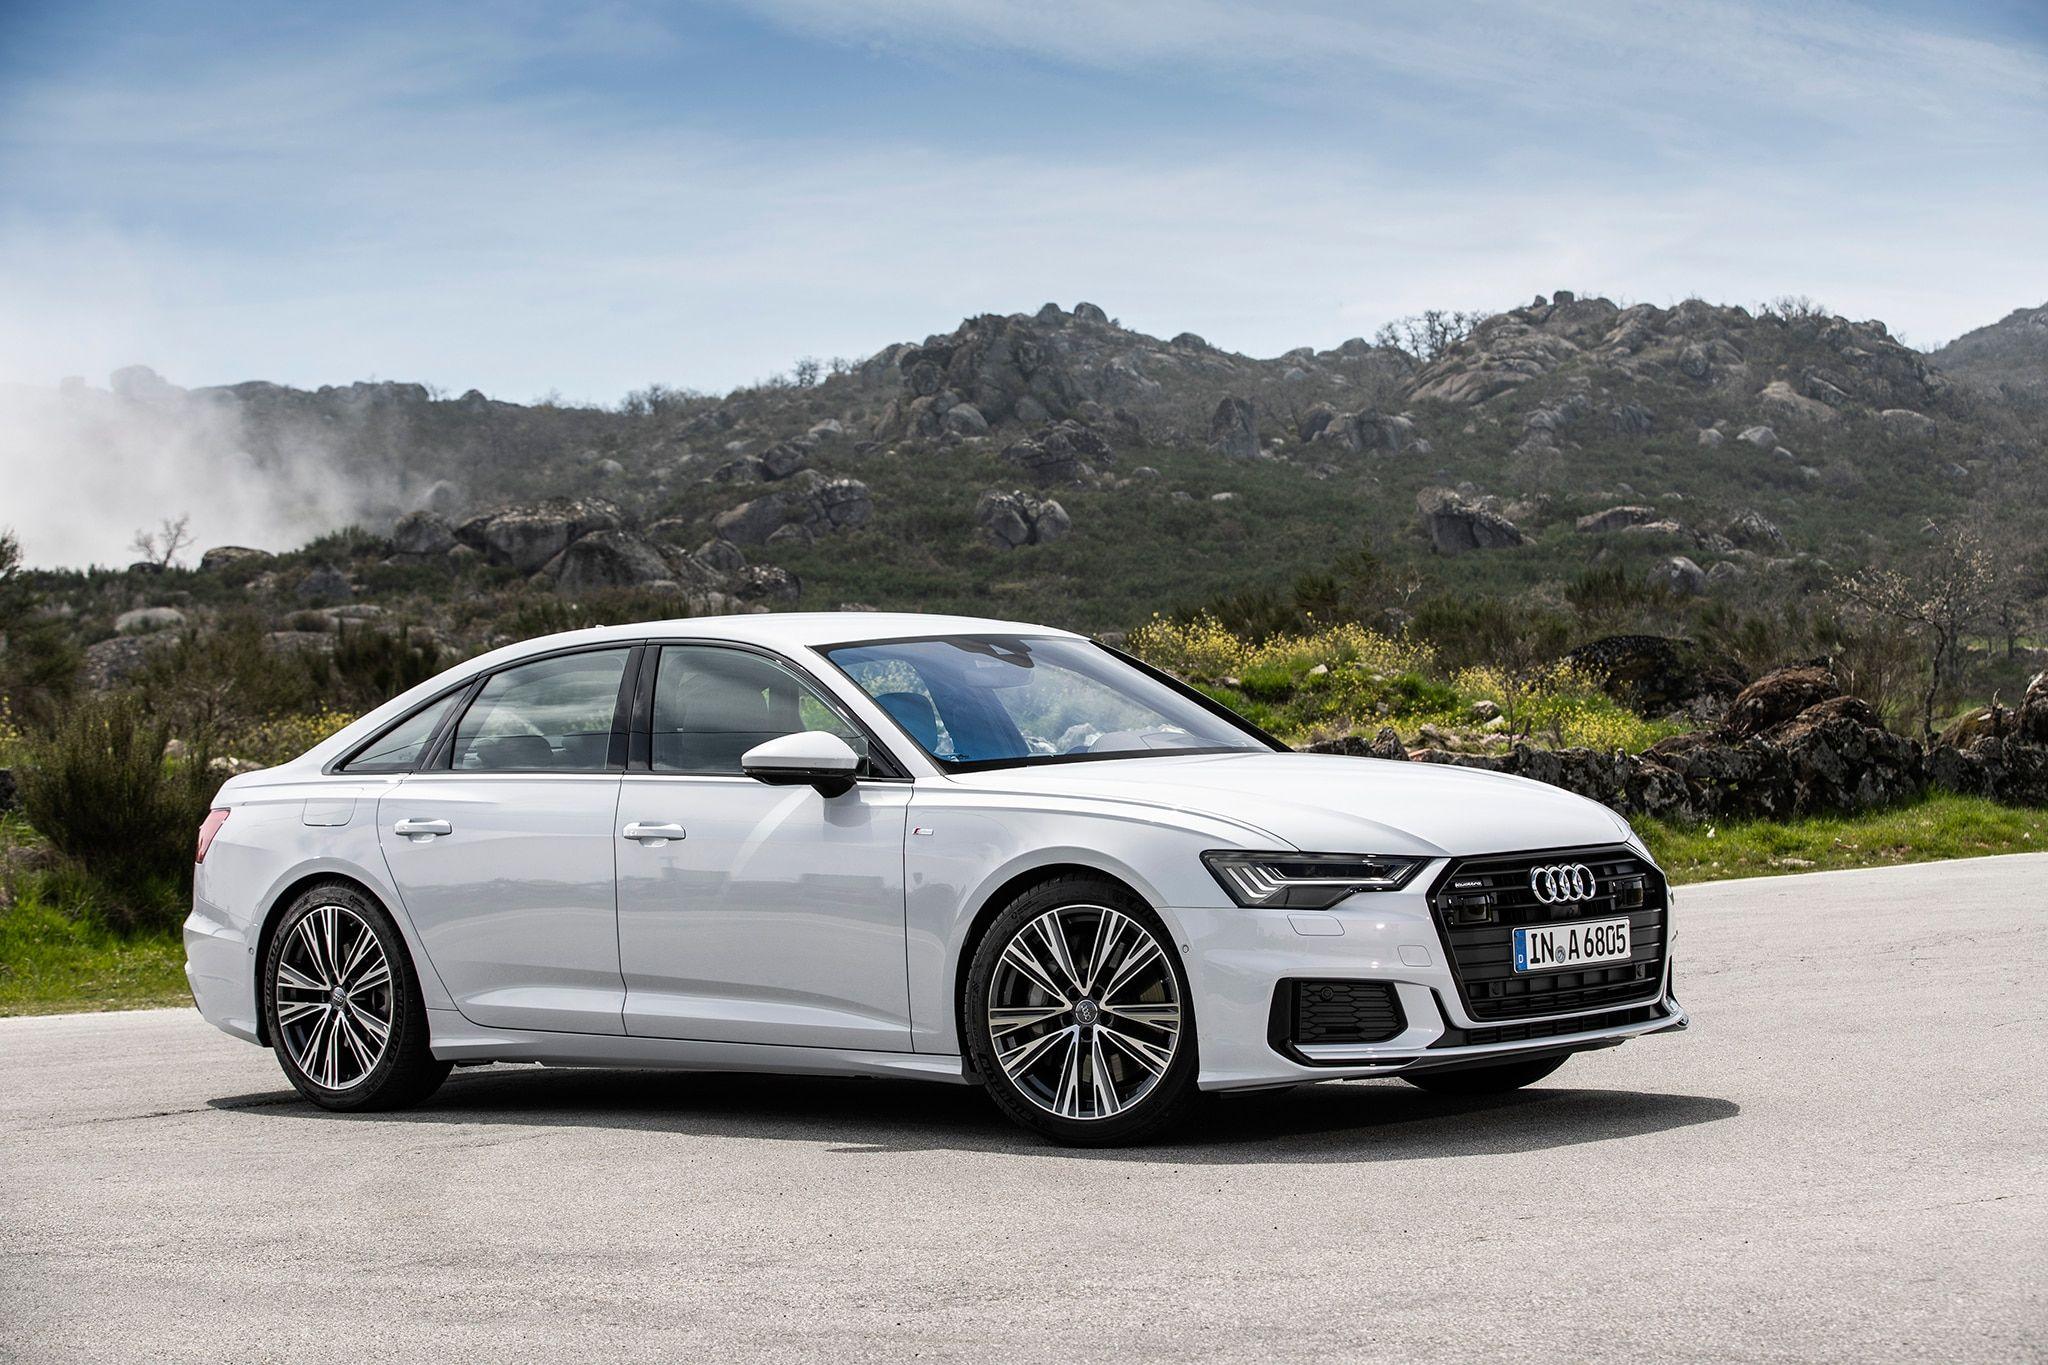 Audi S6 2019 2019 Audi S6 Coupe 2019 Audi S6 Sedan 2019 Audi S6 Specs Audi S6 2019 Audi S6 2019 Avant Audi S6 2019 Diesel Audi S6 2 Audi A6 Audi S6 Bmw